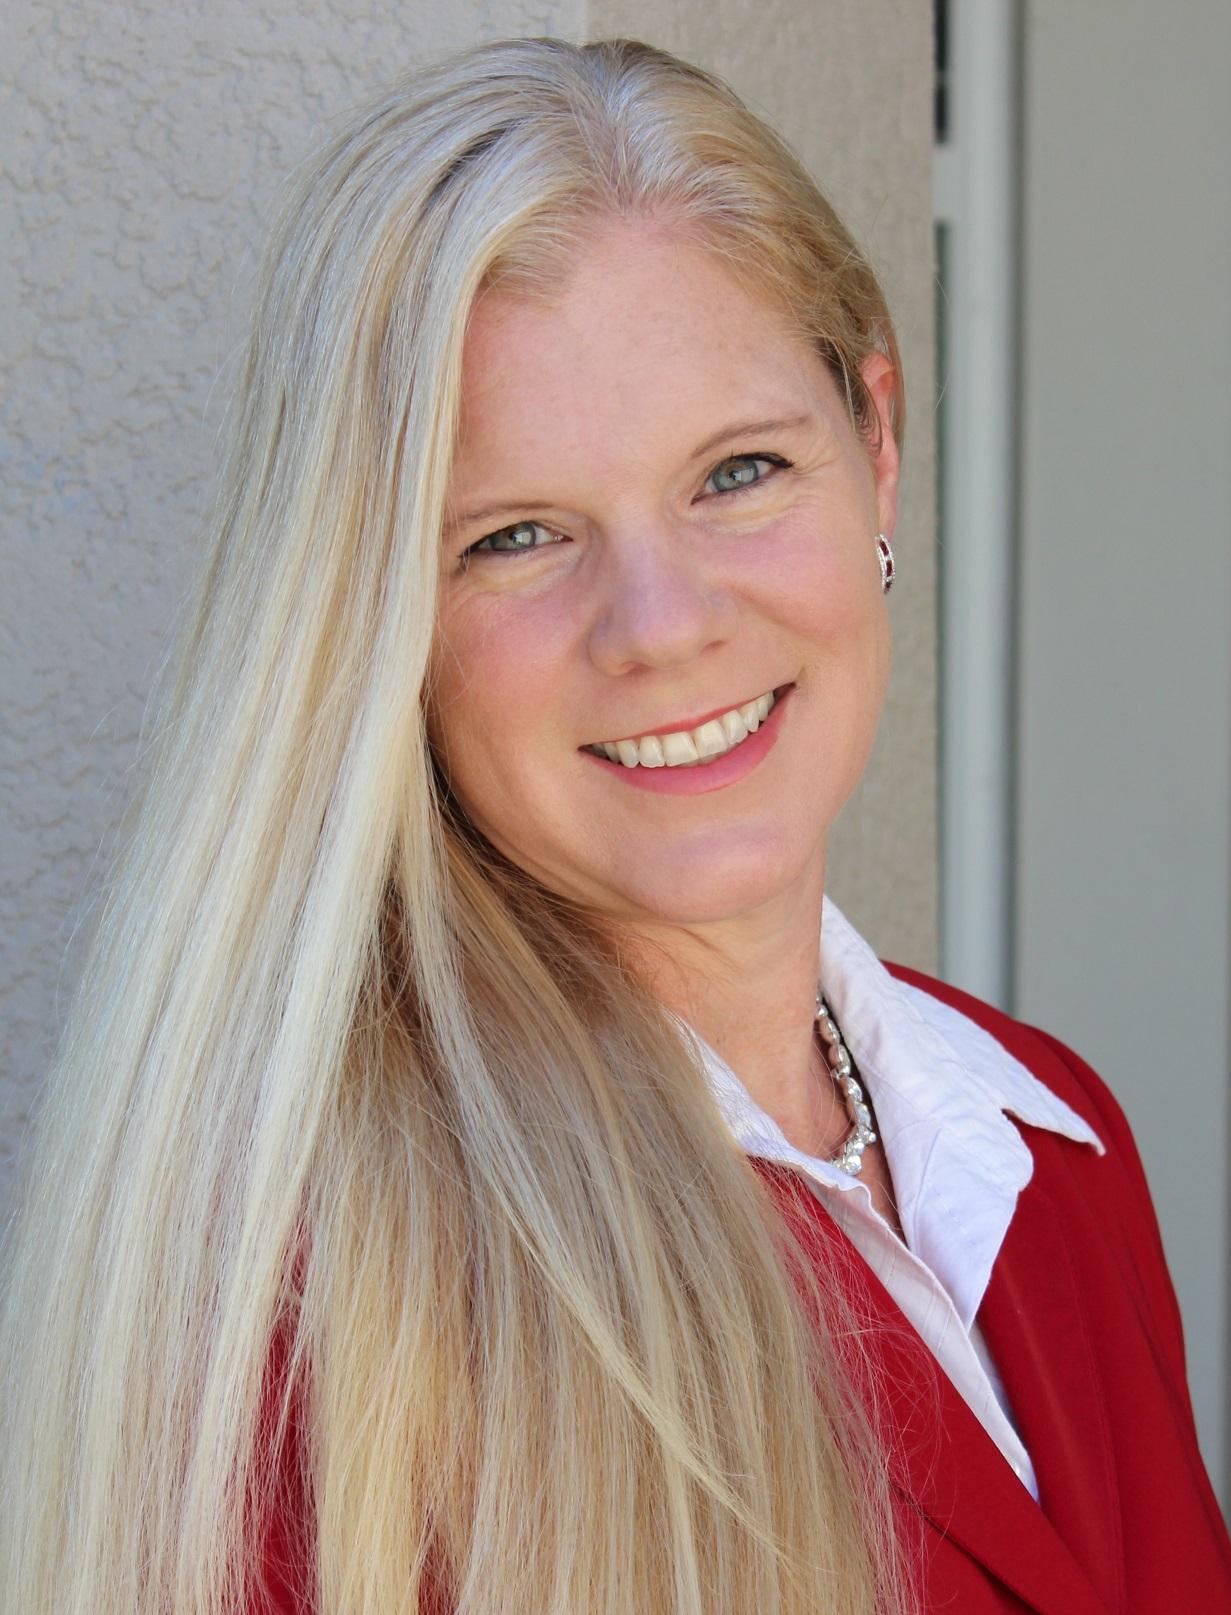 Cynthia Schomer